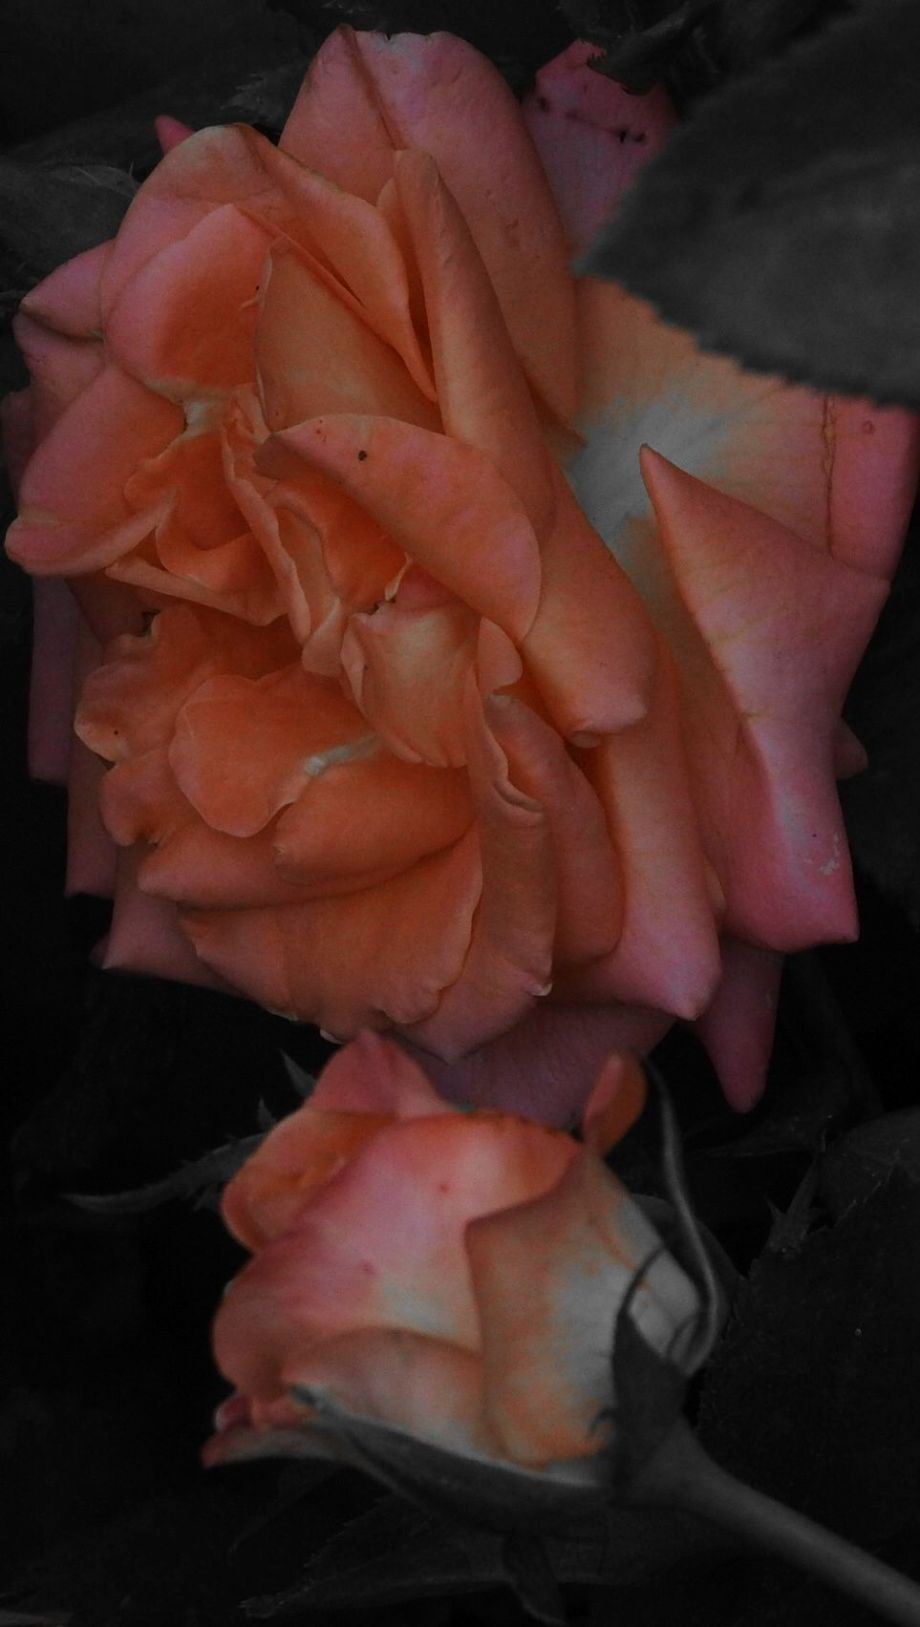 rosecuddles